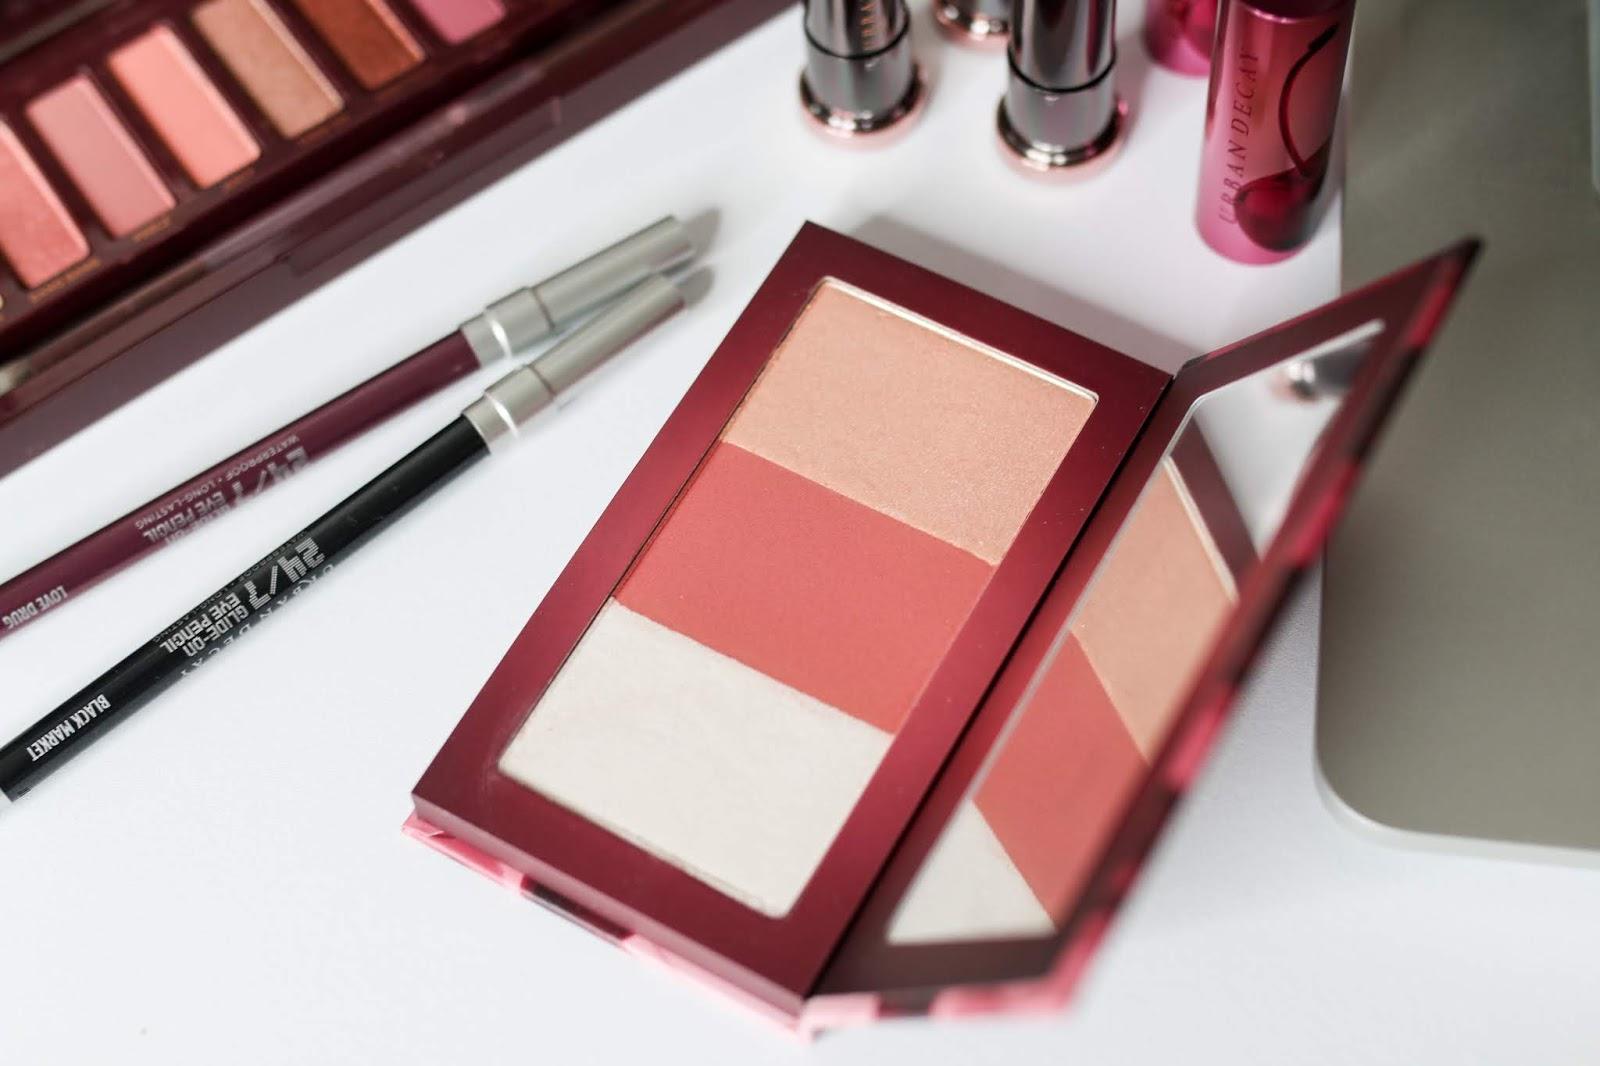 Urban Decay Naked Cherry Eyeshadow Palette